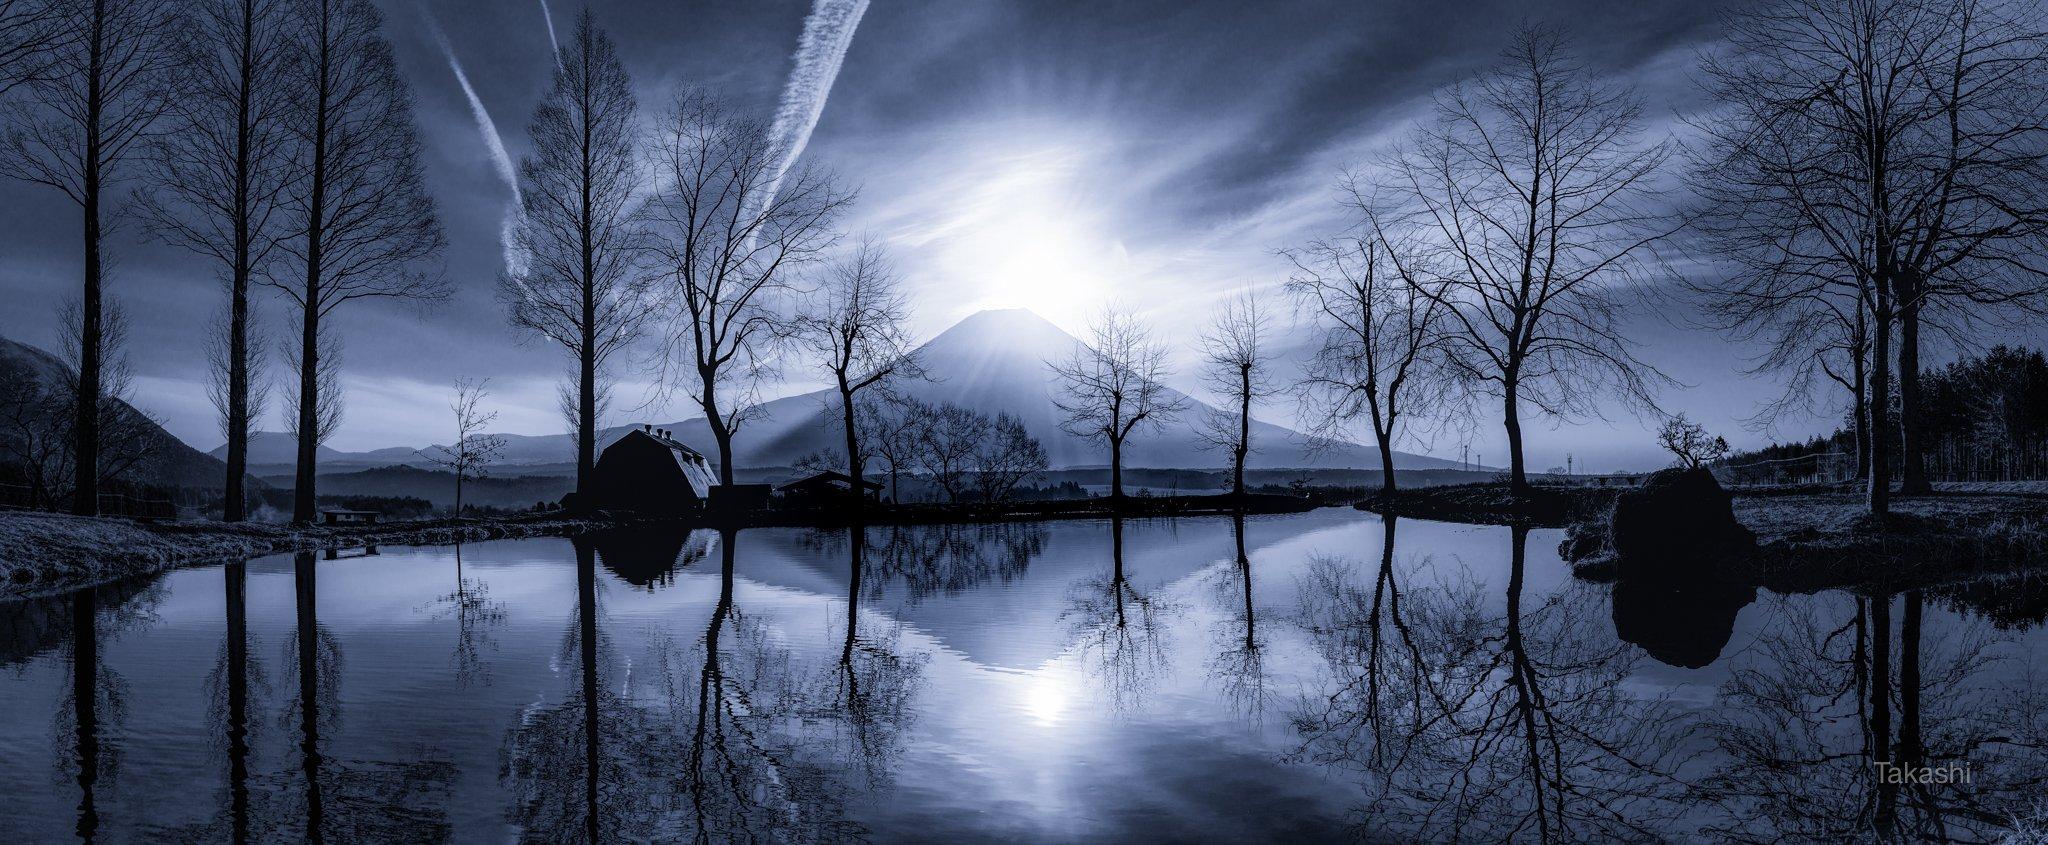 Fuji,Japan,mountain,trees,lake,water,reflection,sun,sunrise,amazing,fantastic,, Takashi